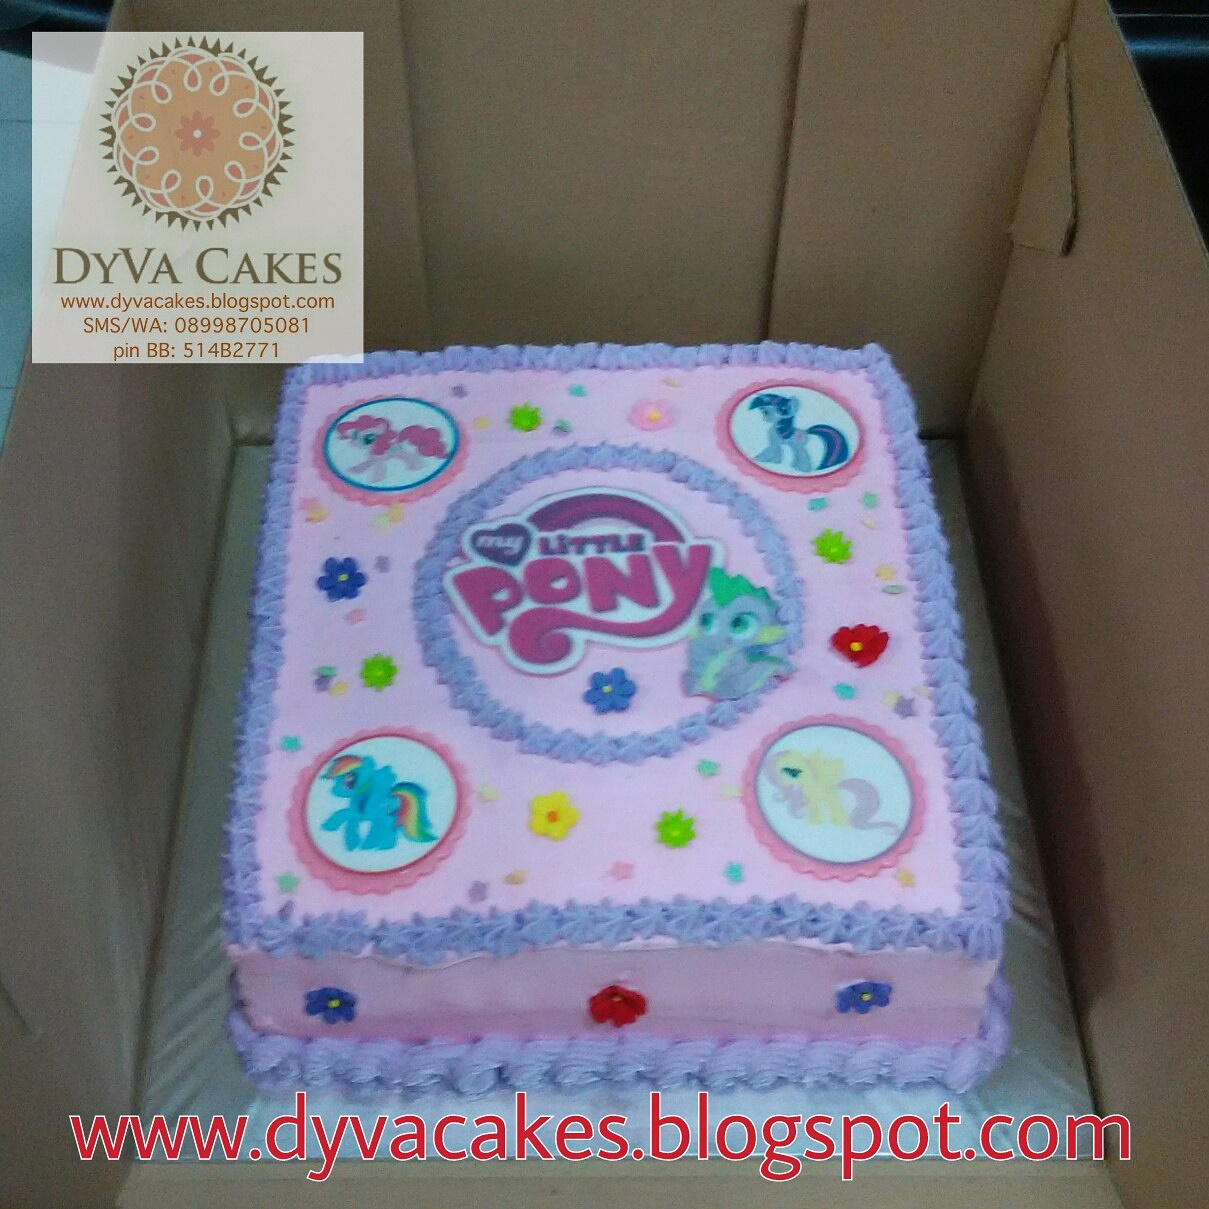 Dyva Cakes My Little Pony Buttercream Cake